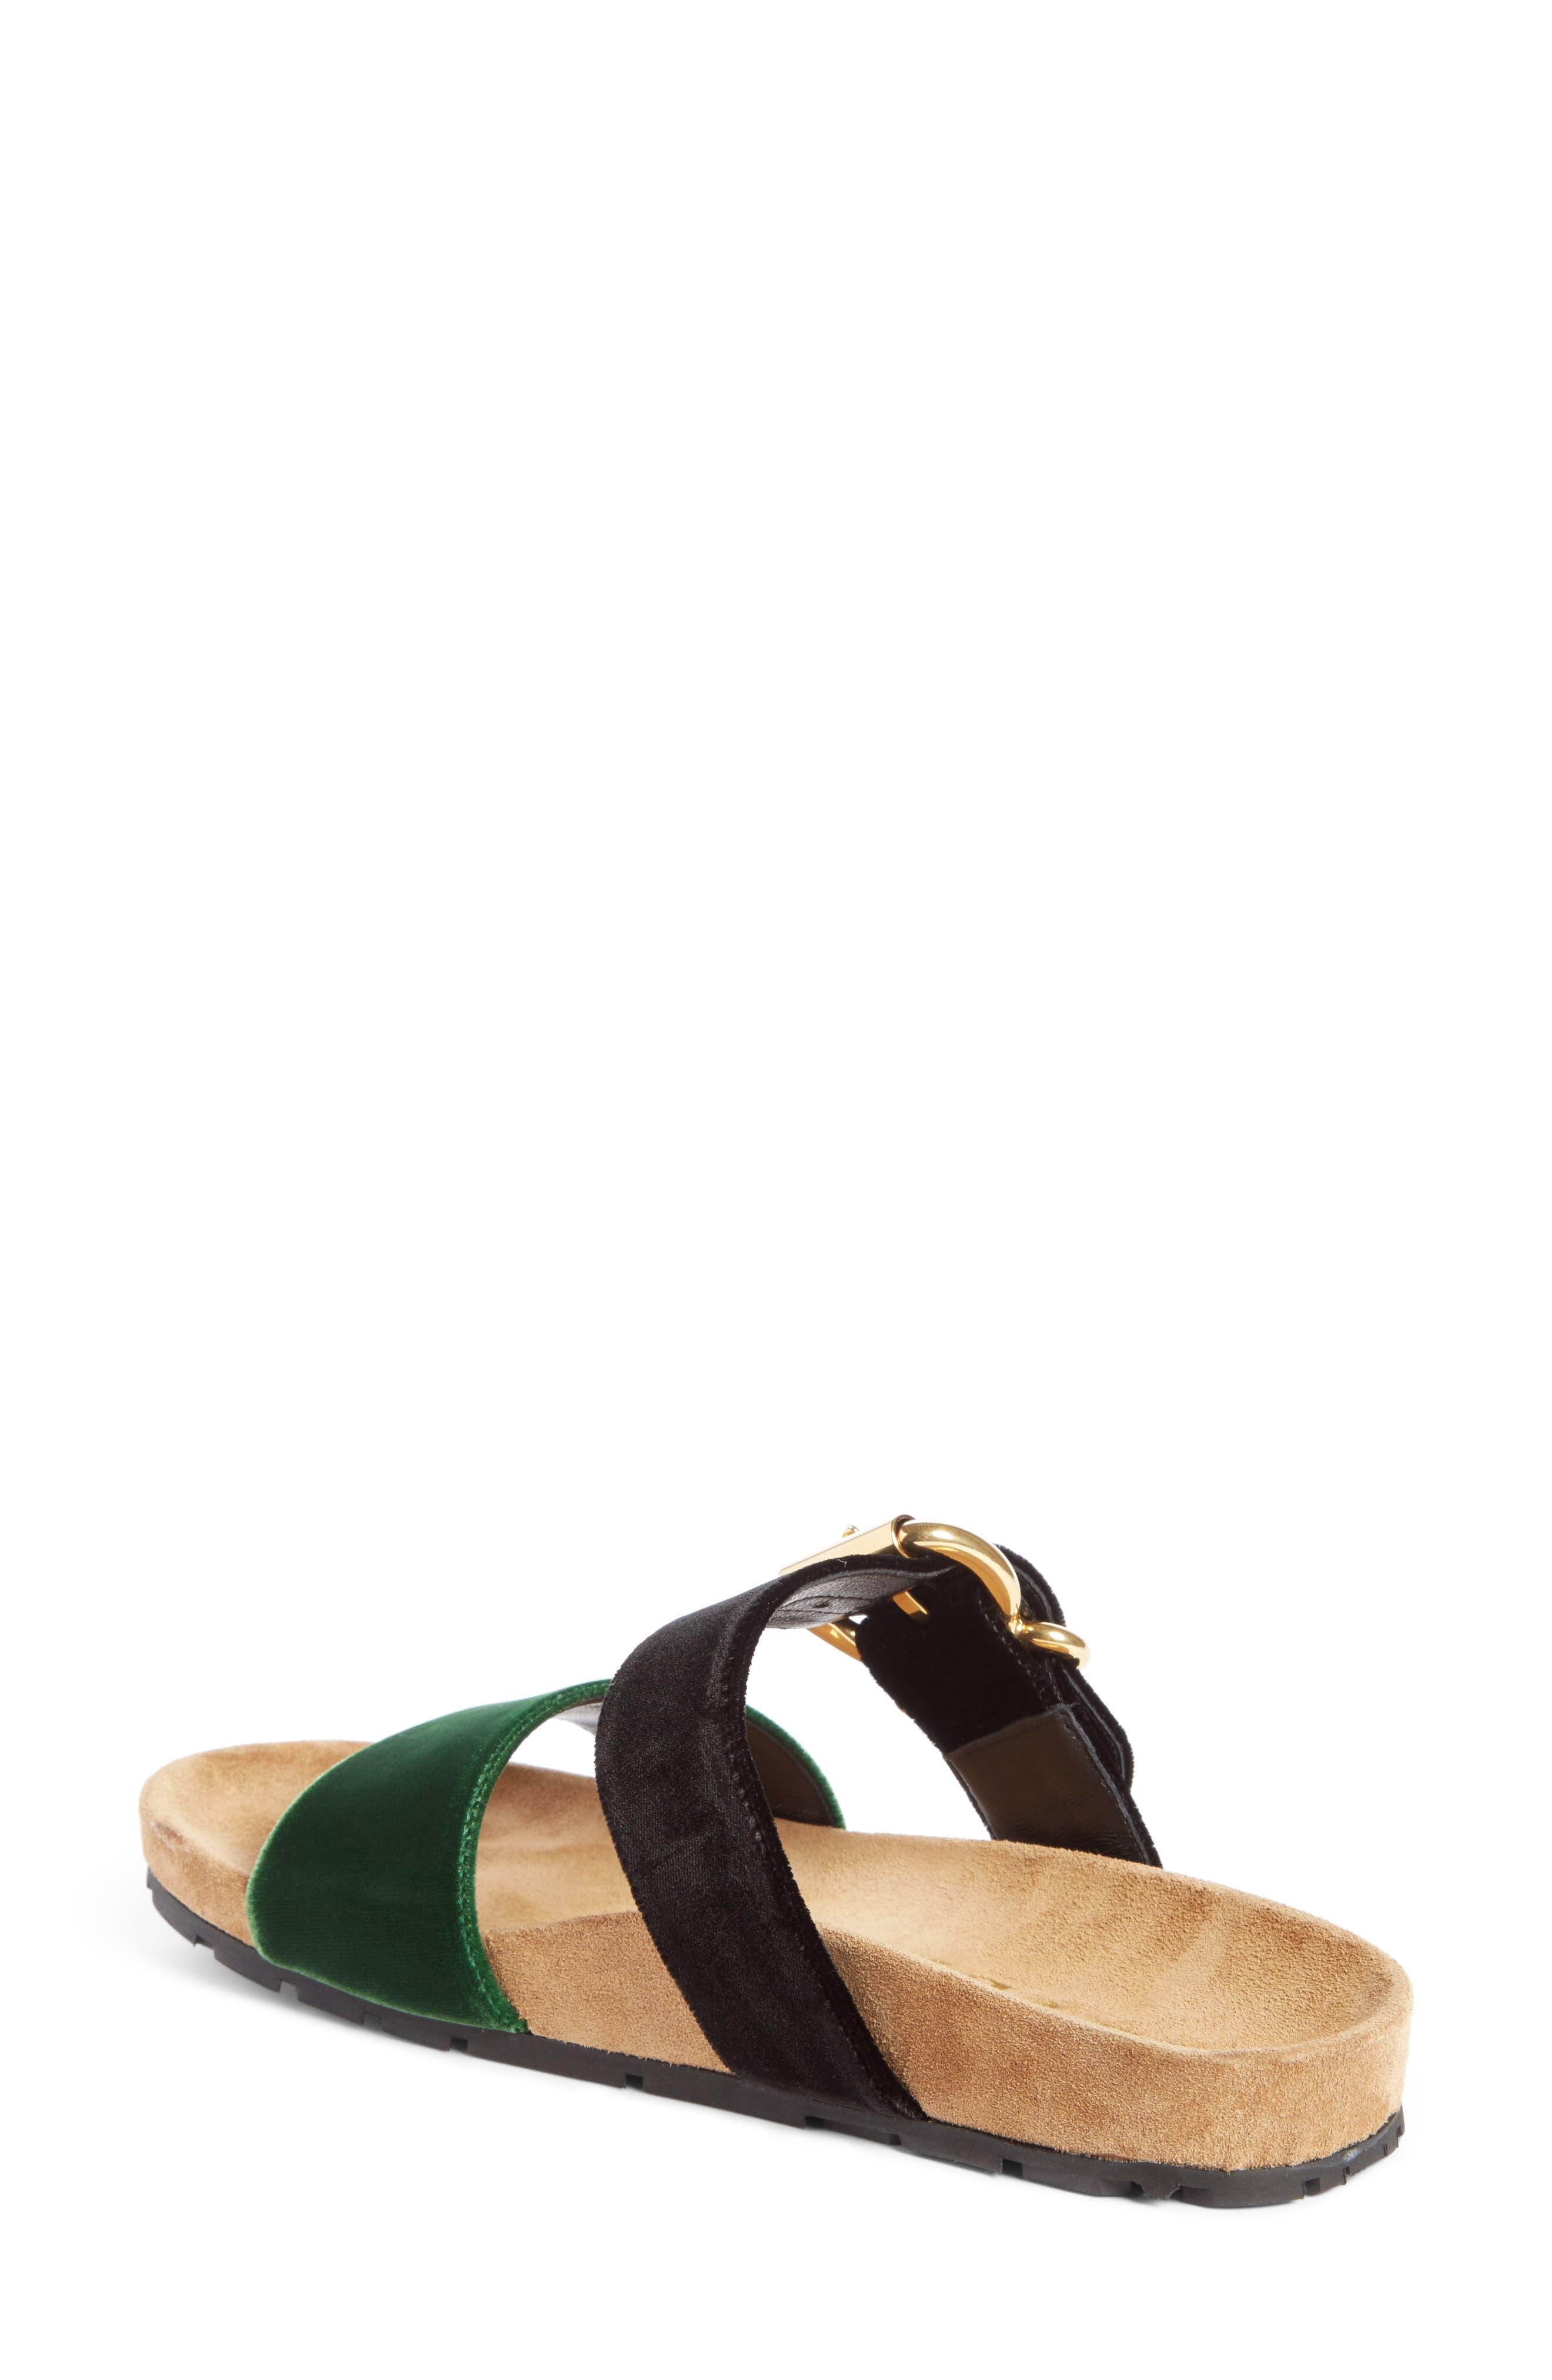 Double Band Slide Sandal,                             Alternate thumbnail 2, color,                             300